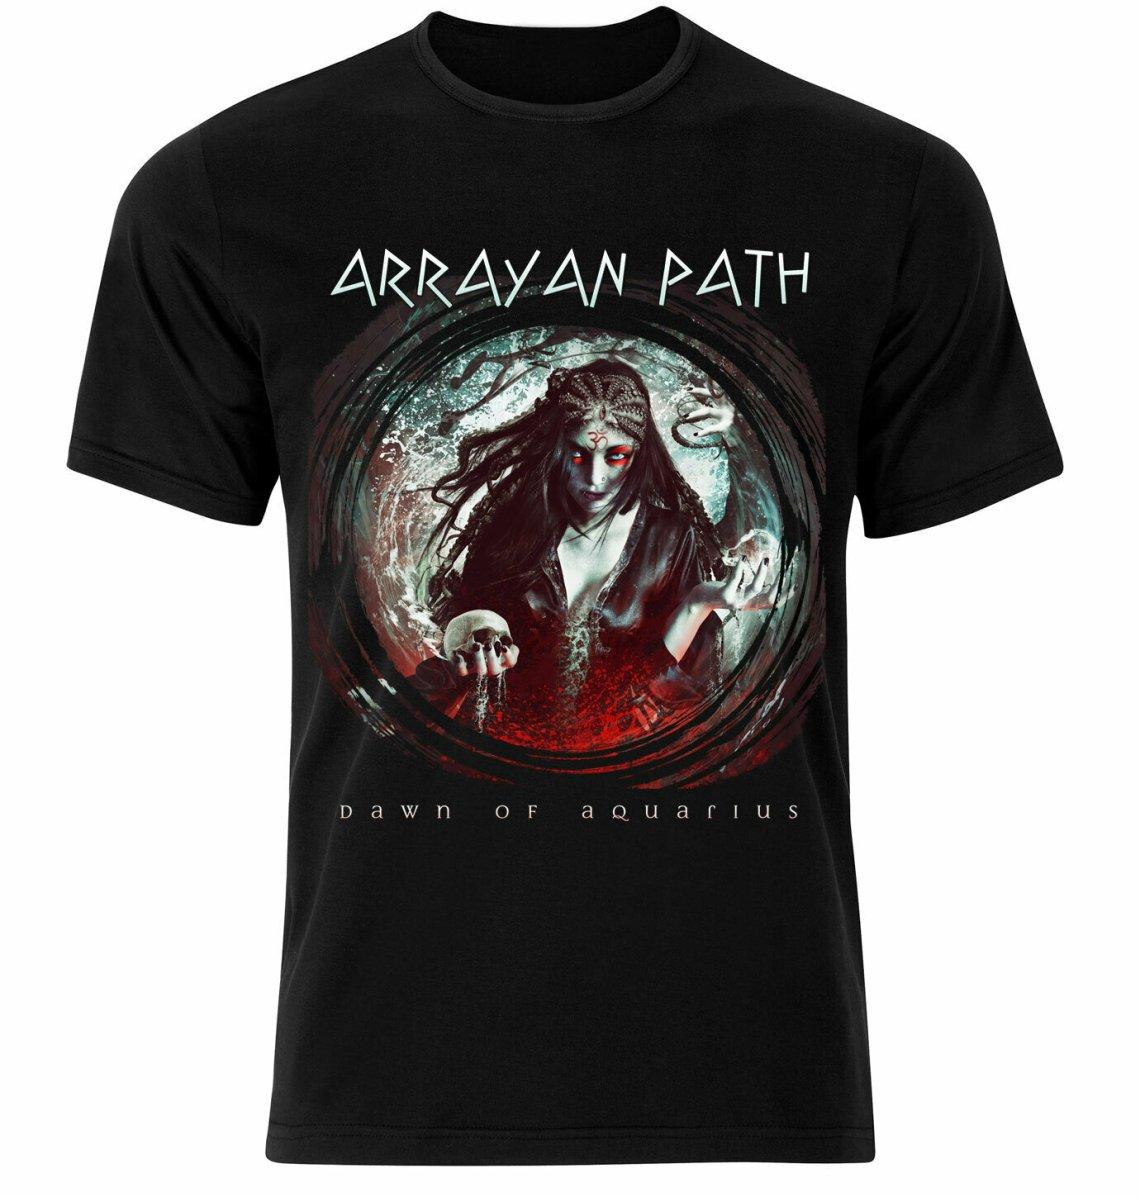 ARRAYAN PATH - Dawn of Aquarius Tshirt